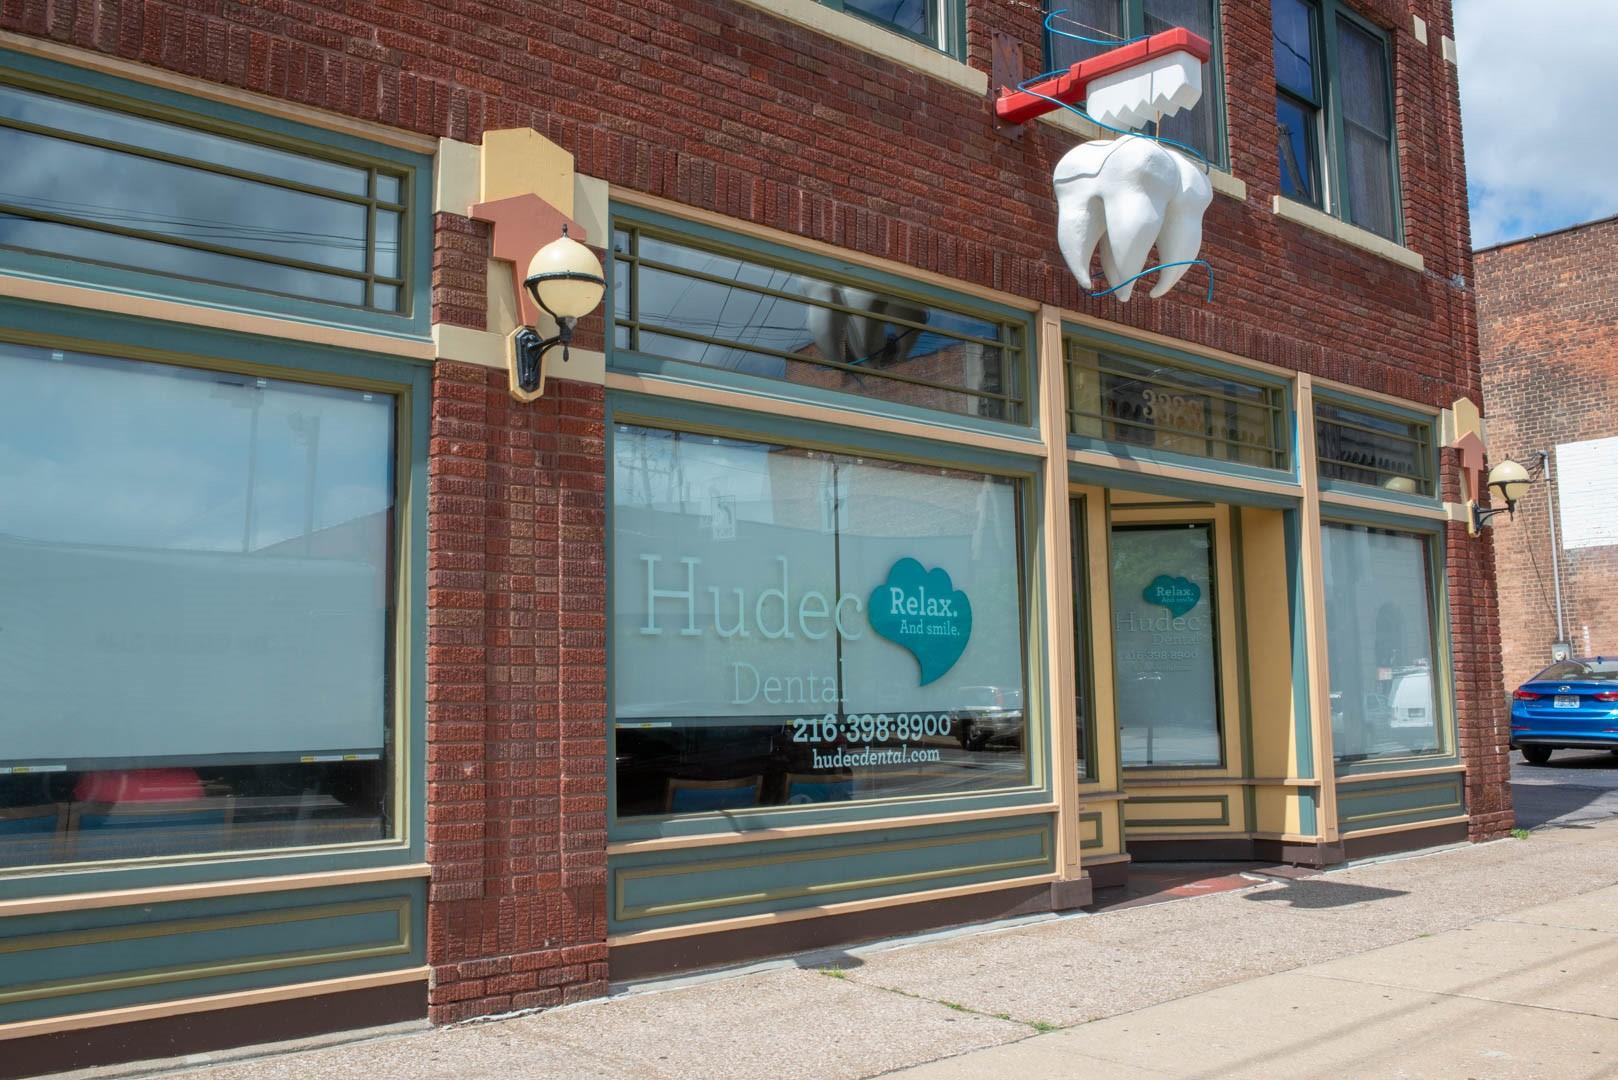 Hudec Dental - Cleveland, Ohio Dentists - Broadview Rd